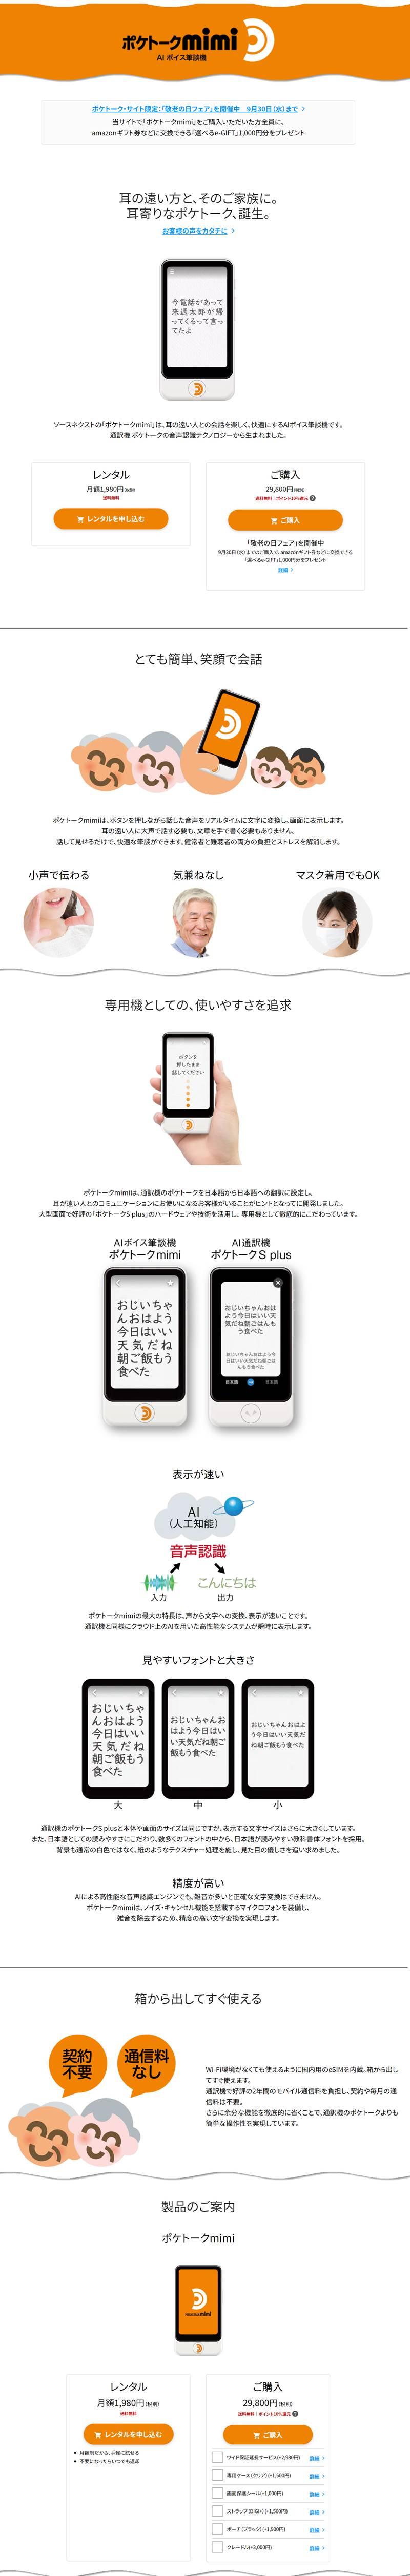 AIボイス筆談機 POCKETALK mimi(2年)のキャンペーン